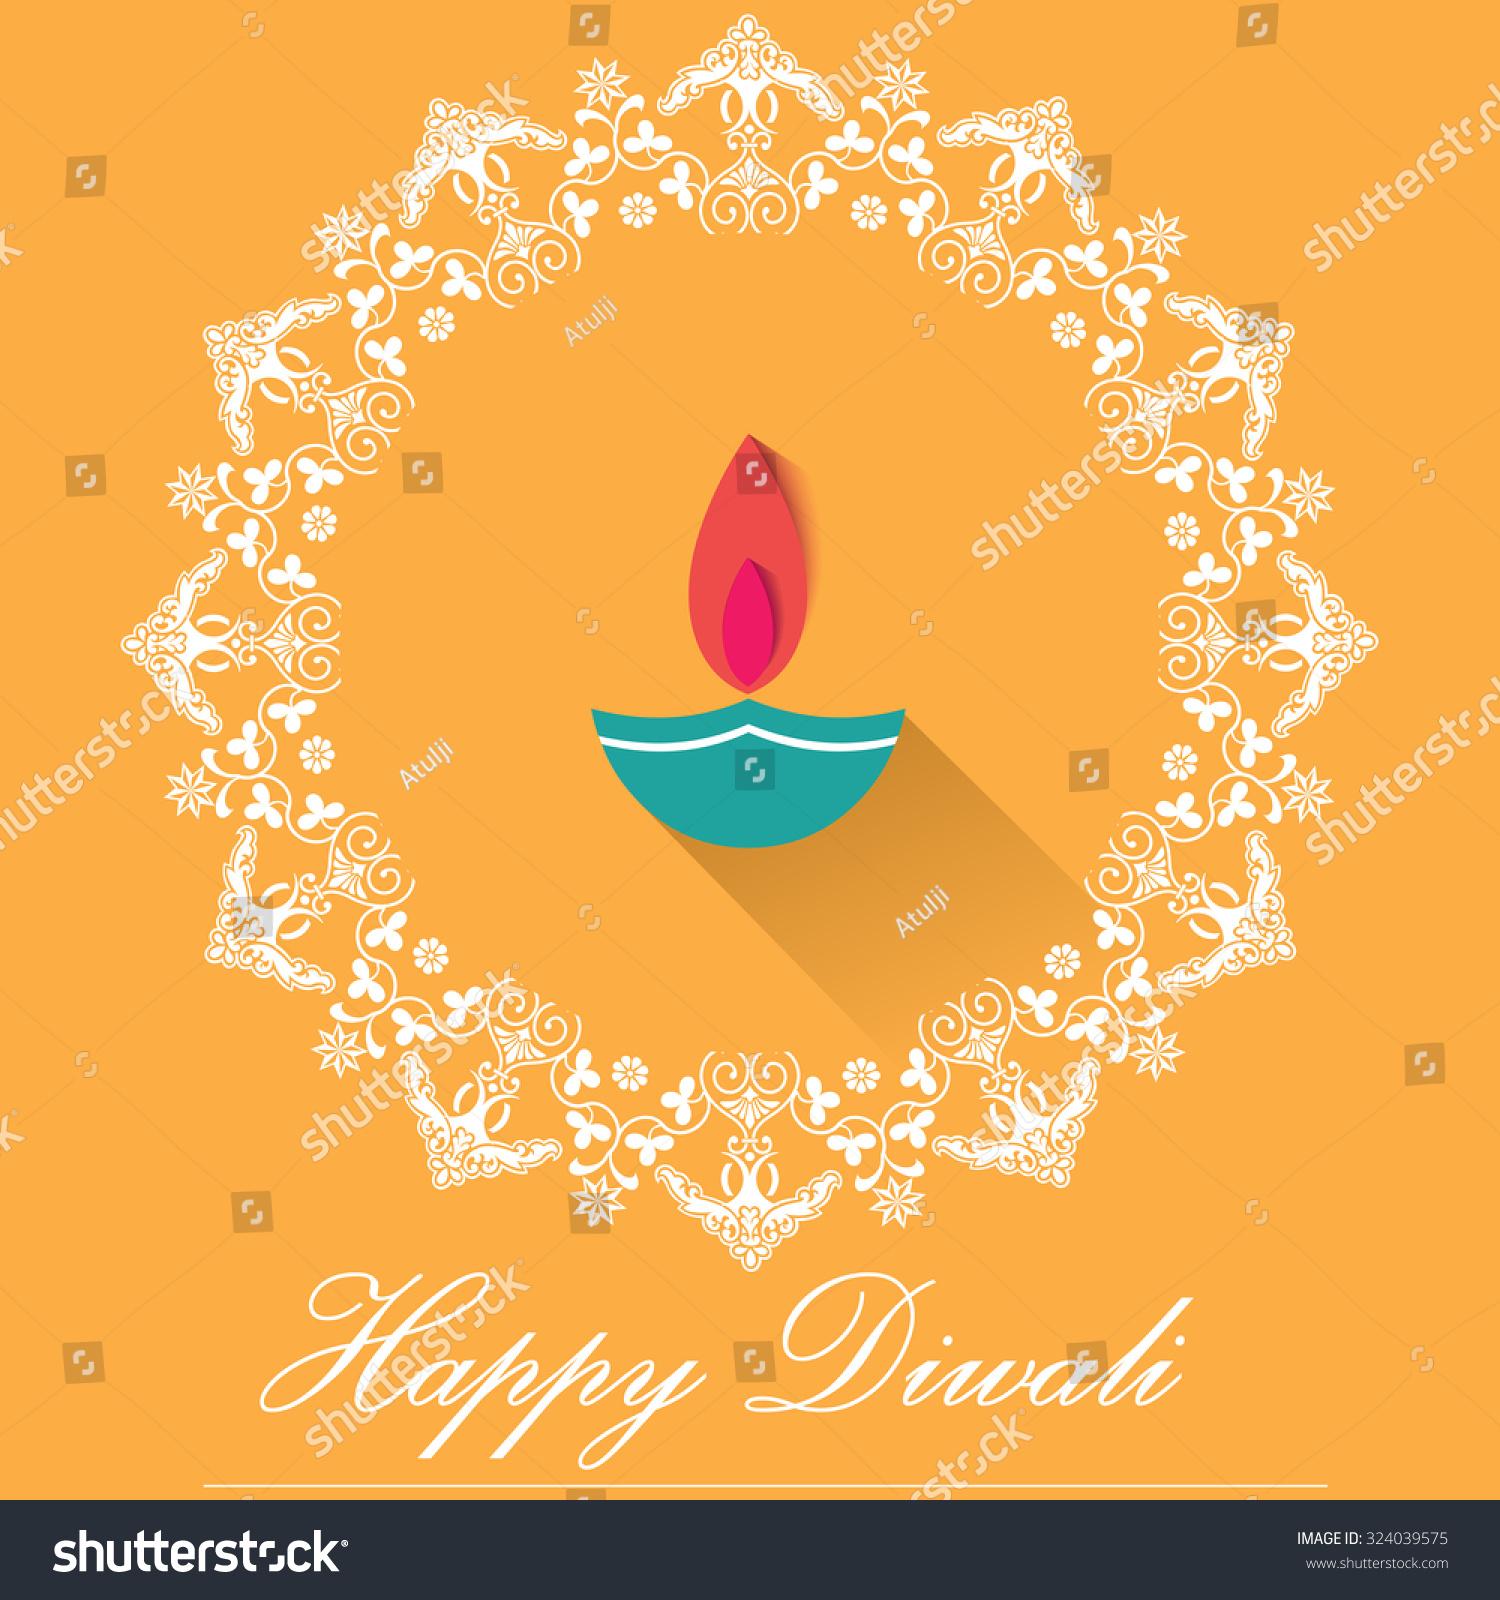 Decorative diwali lamps happy diwali greeting stock vector decorative diwali lamps happy diwali greeting card flat design vector eps10 kristyandbryce Choice Image